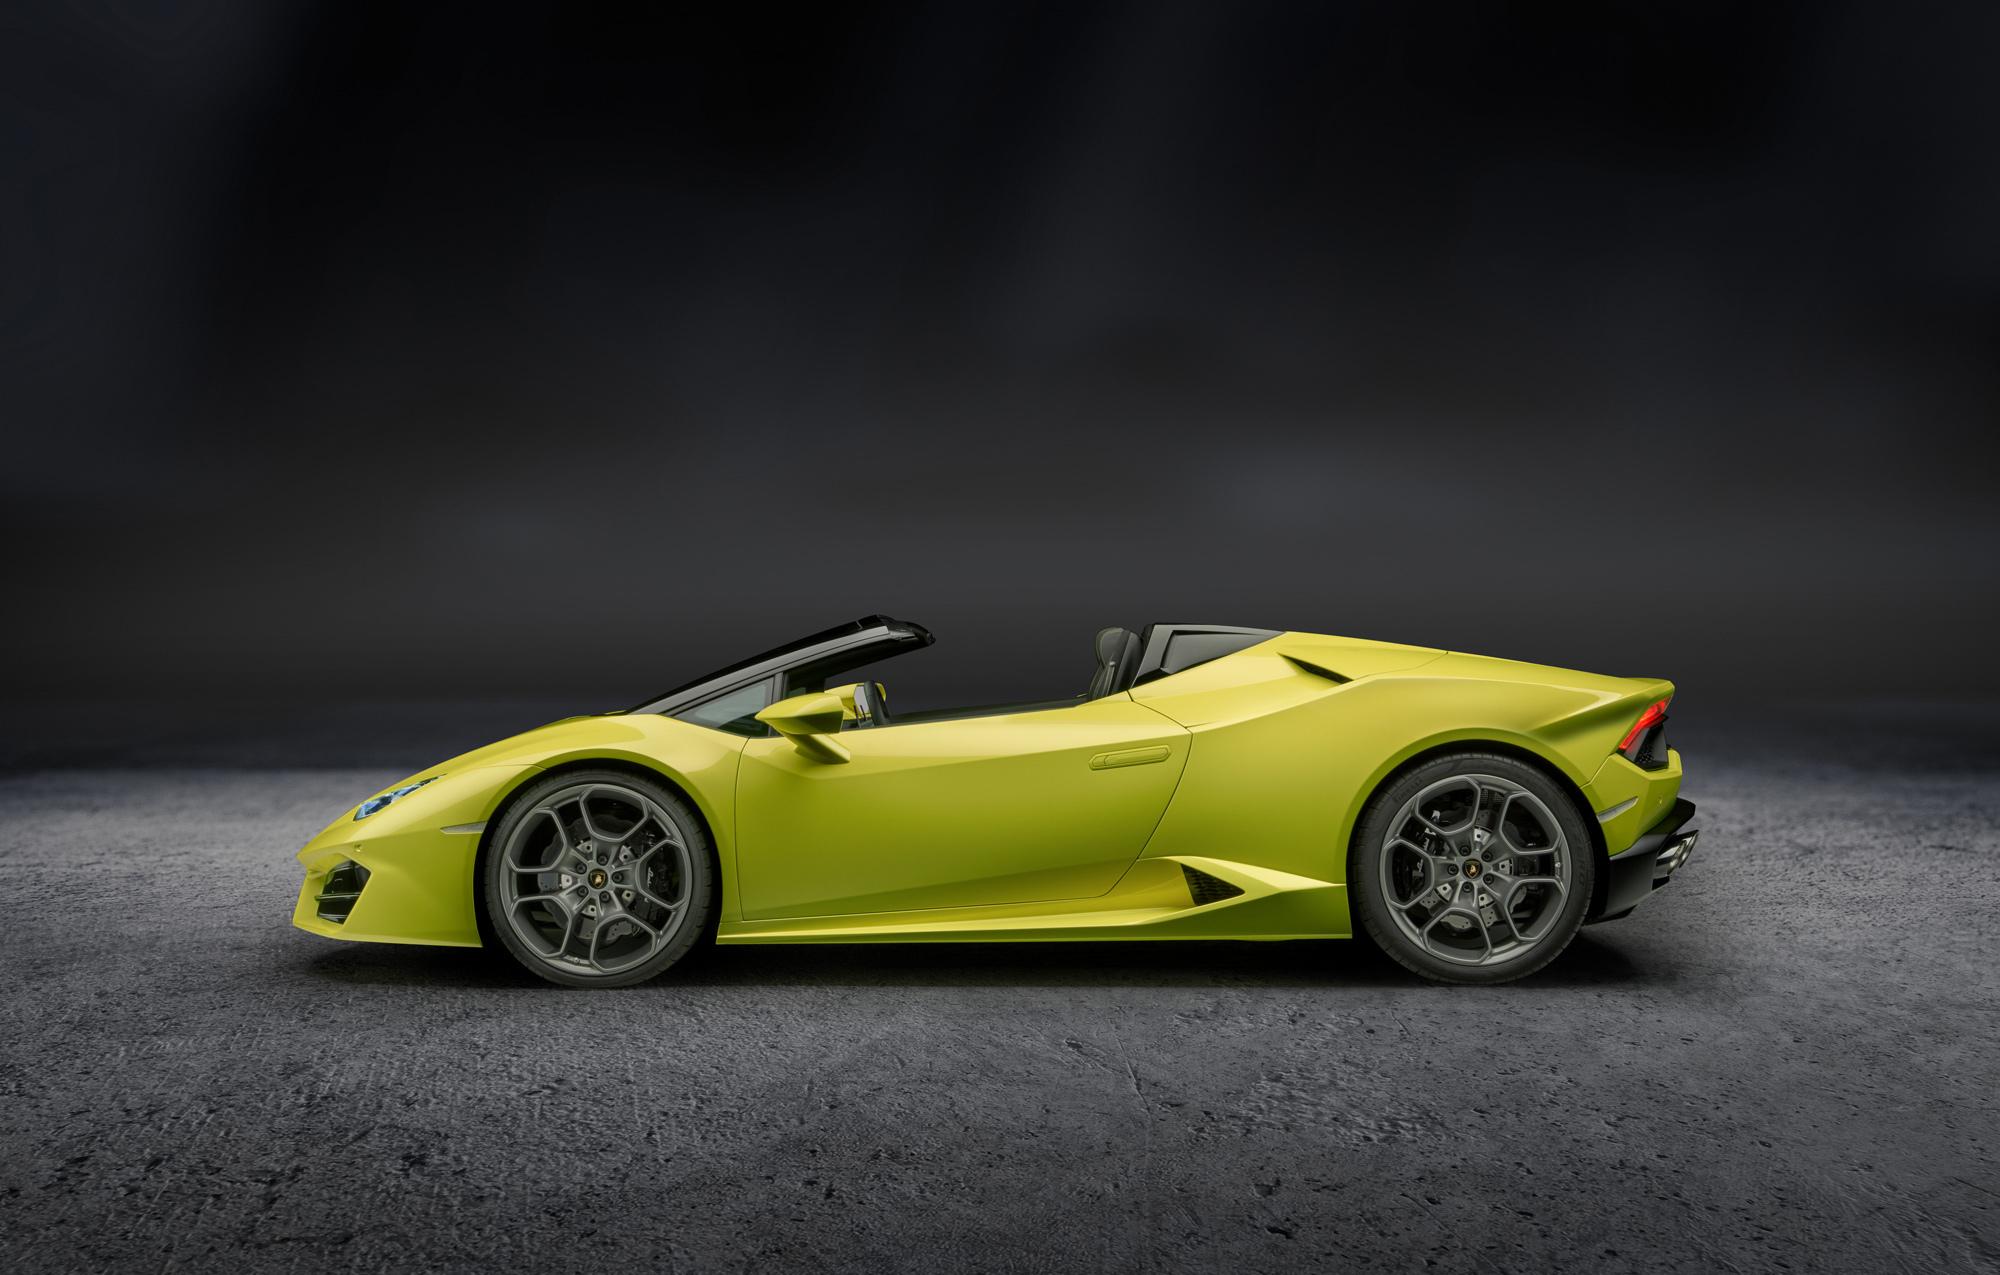 Pictures Of Lamborghini Huracan Rwd Spyder